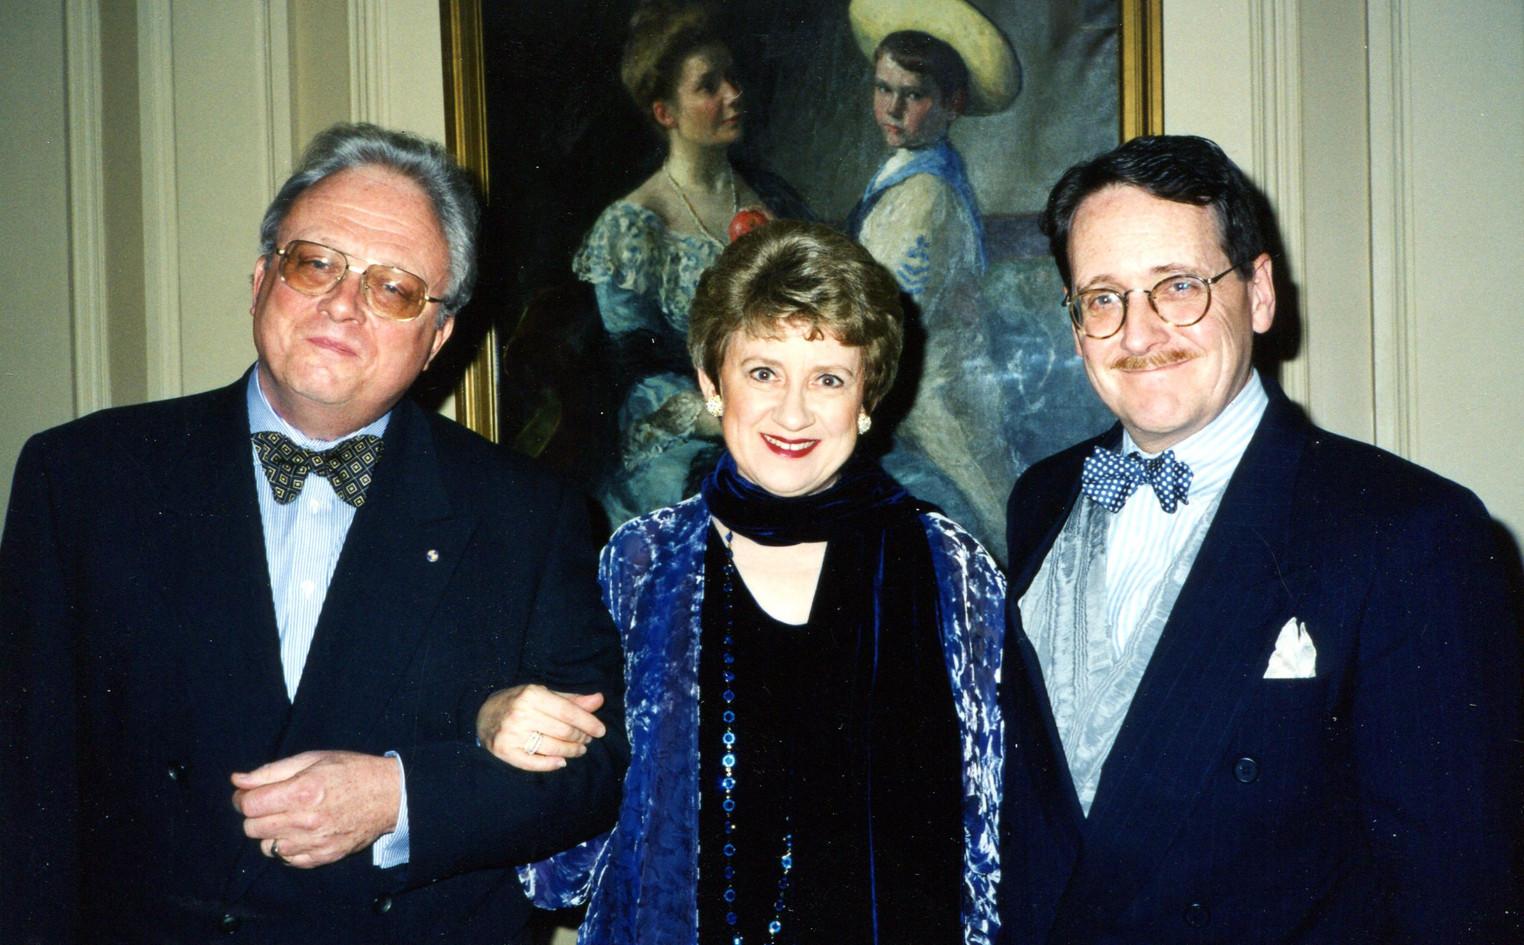 With Bill Bolcom, Joan Morris, 1998